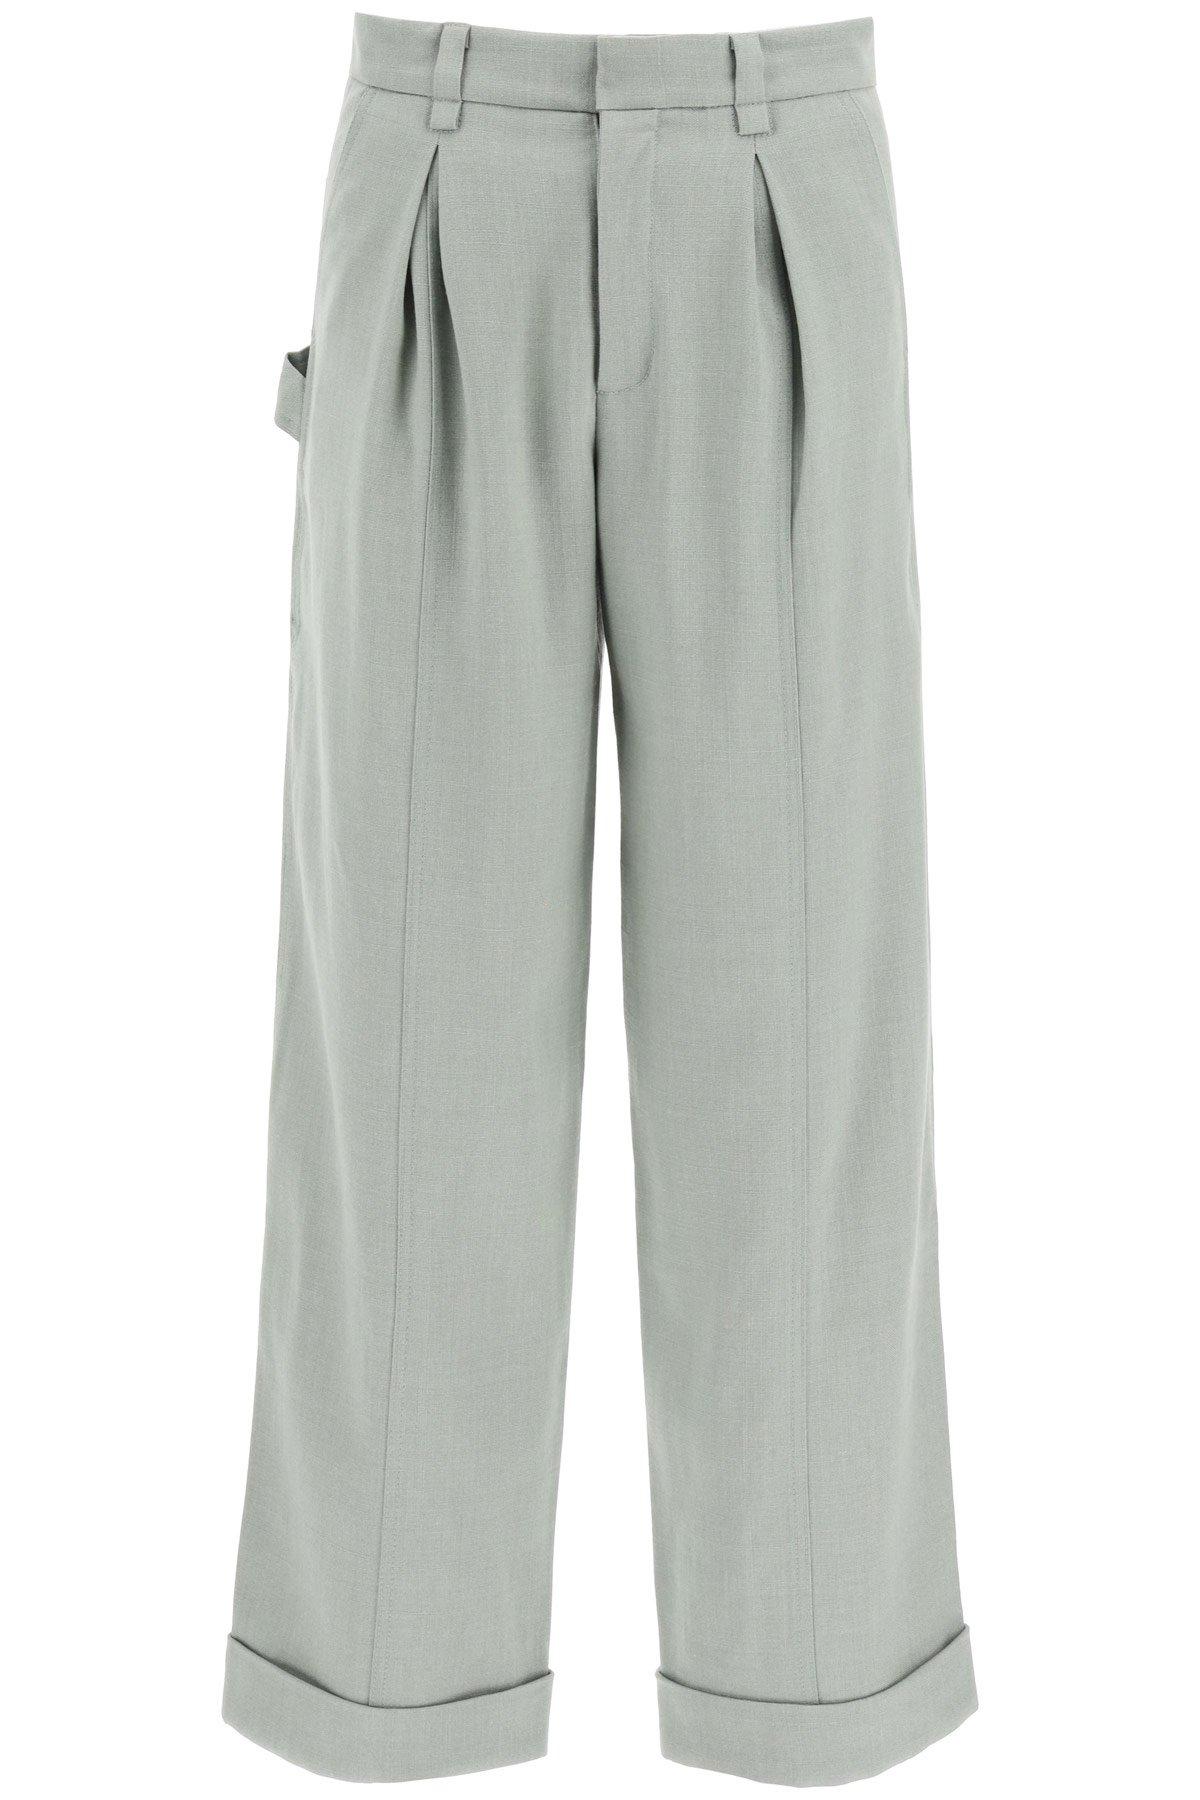 Jacquemus pantaloni cavou